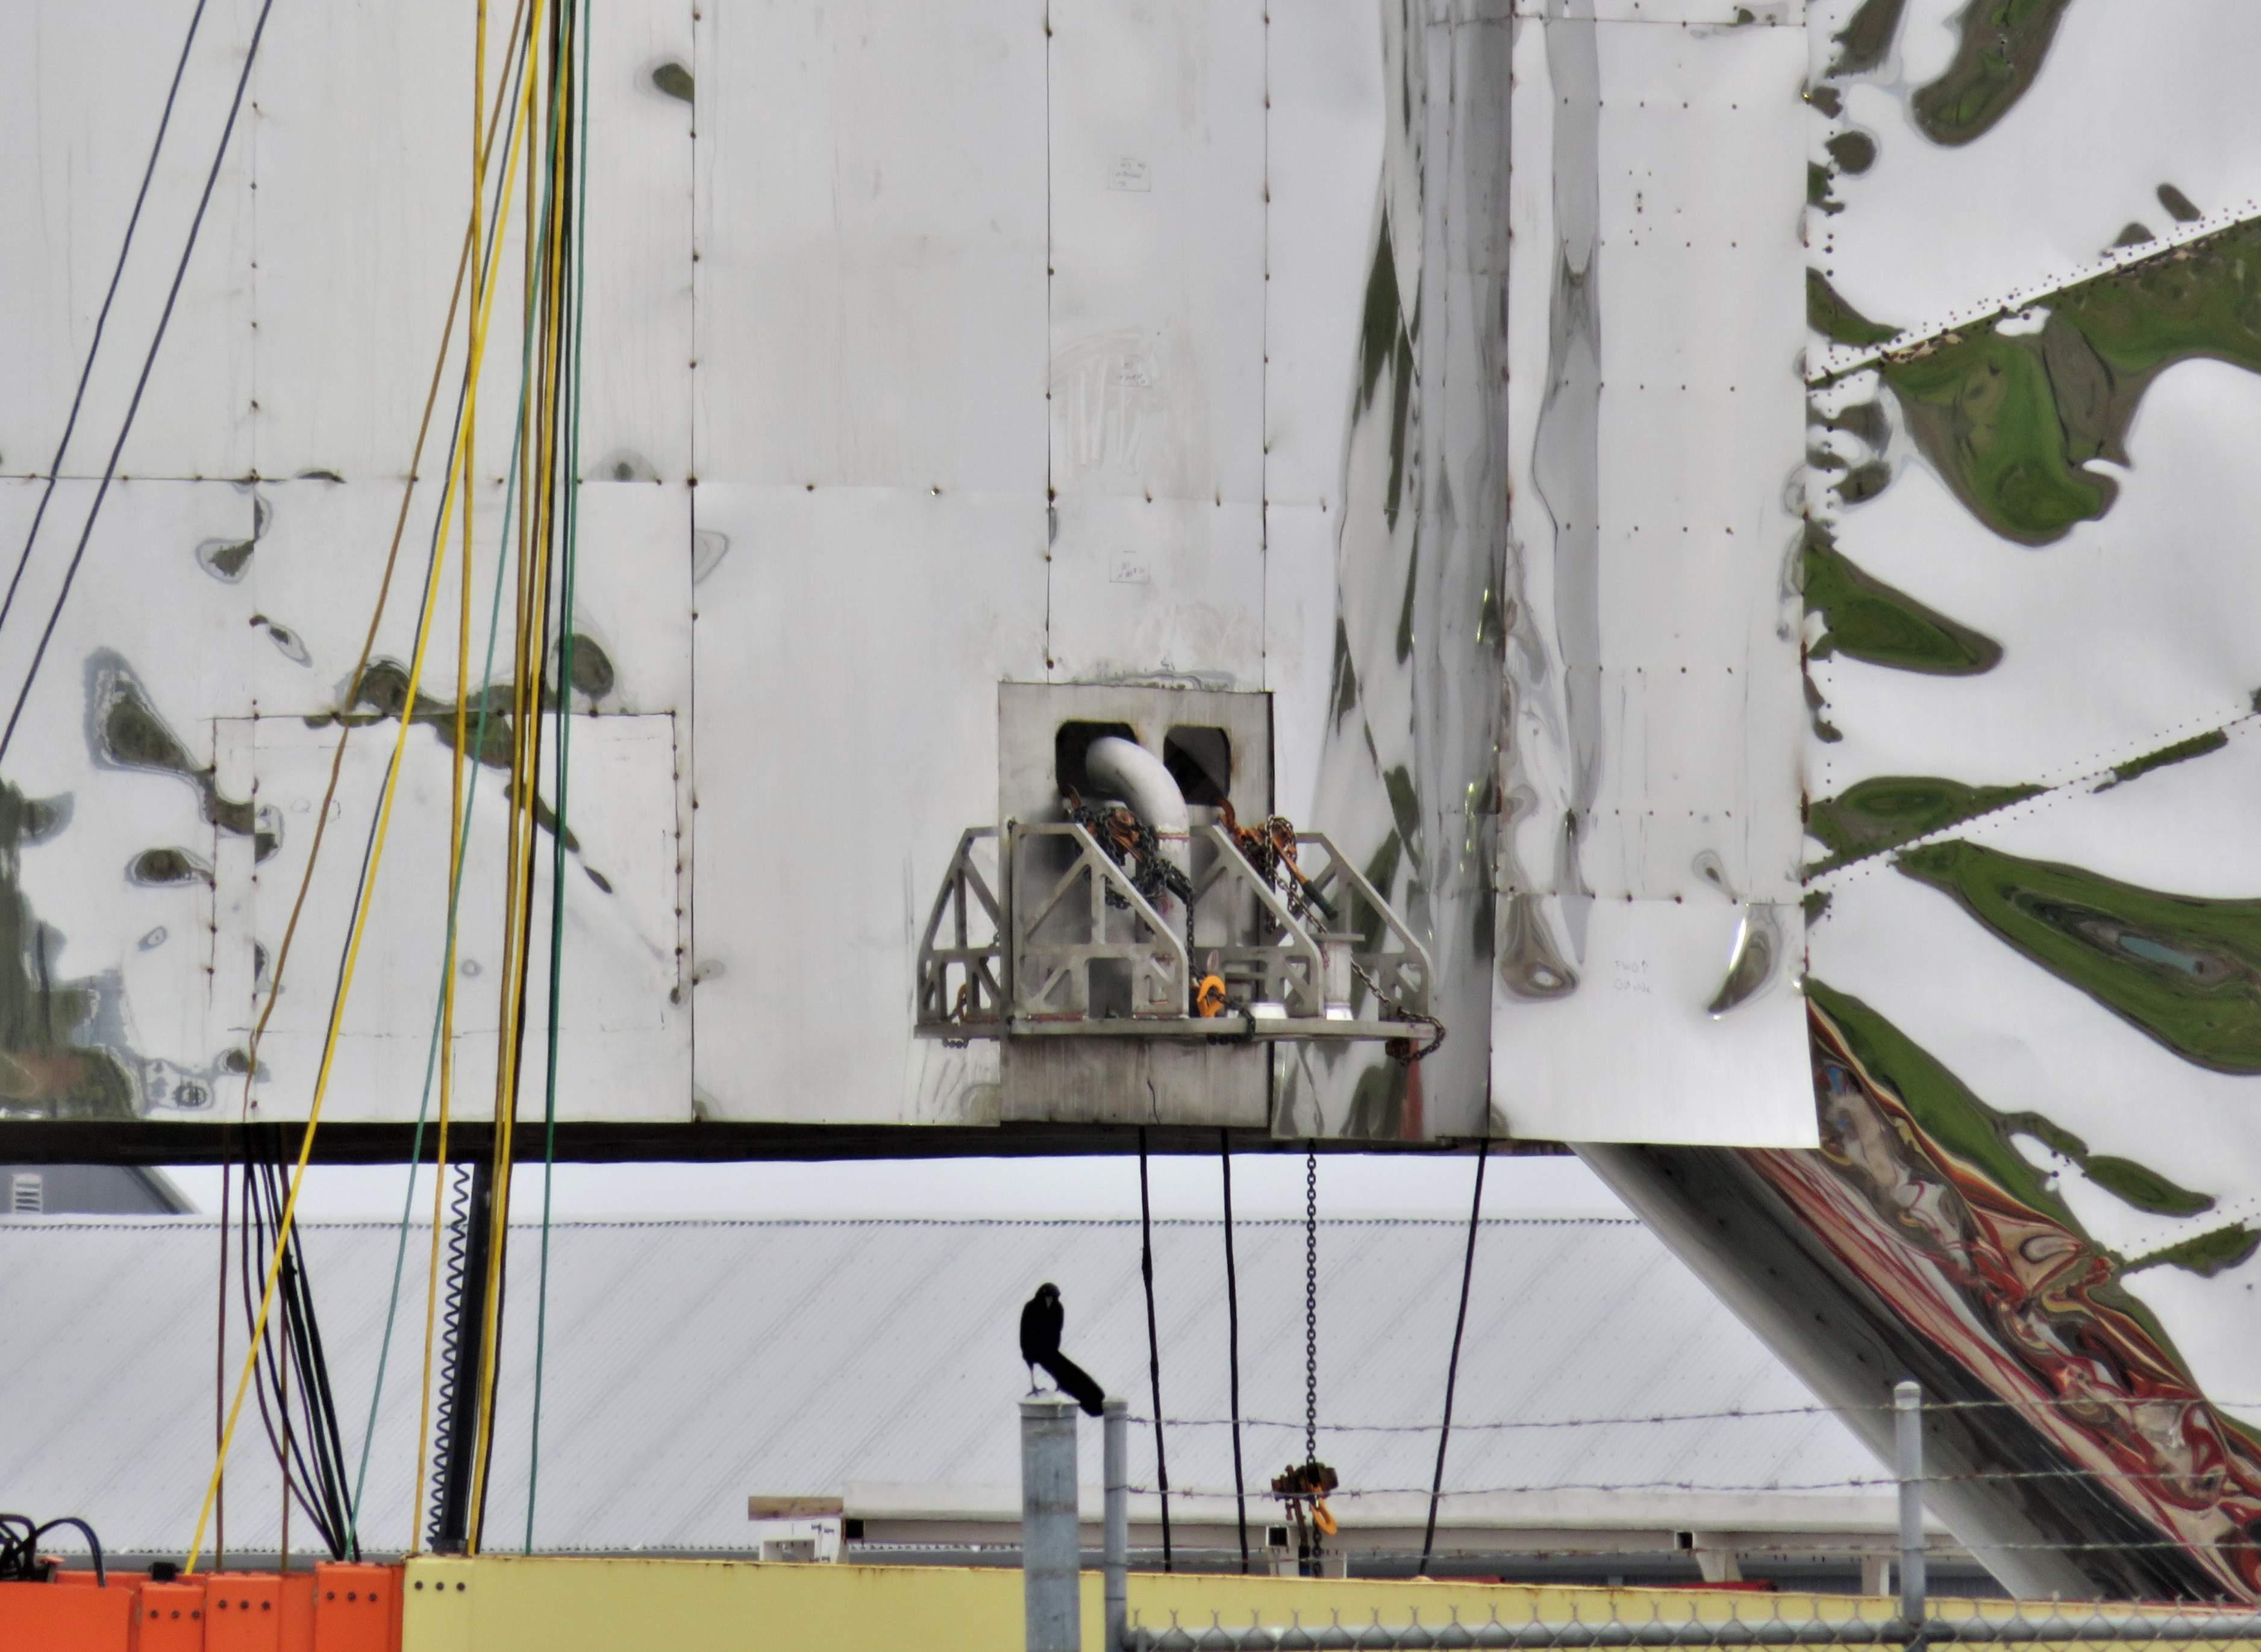 Boca Chica Starship progress 020419 (NASASpaceflight – bocachicagal) 2 (c)